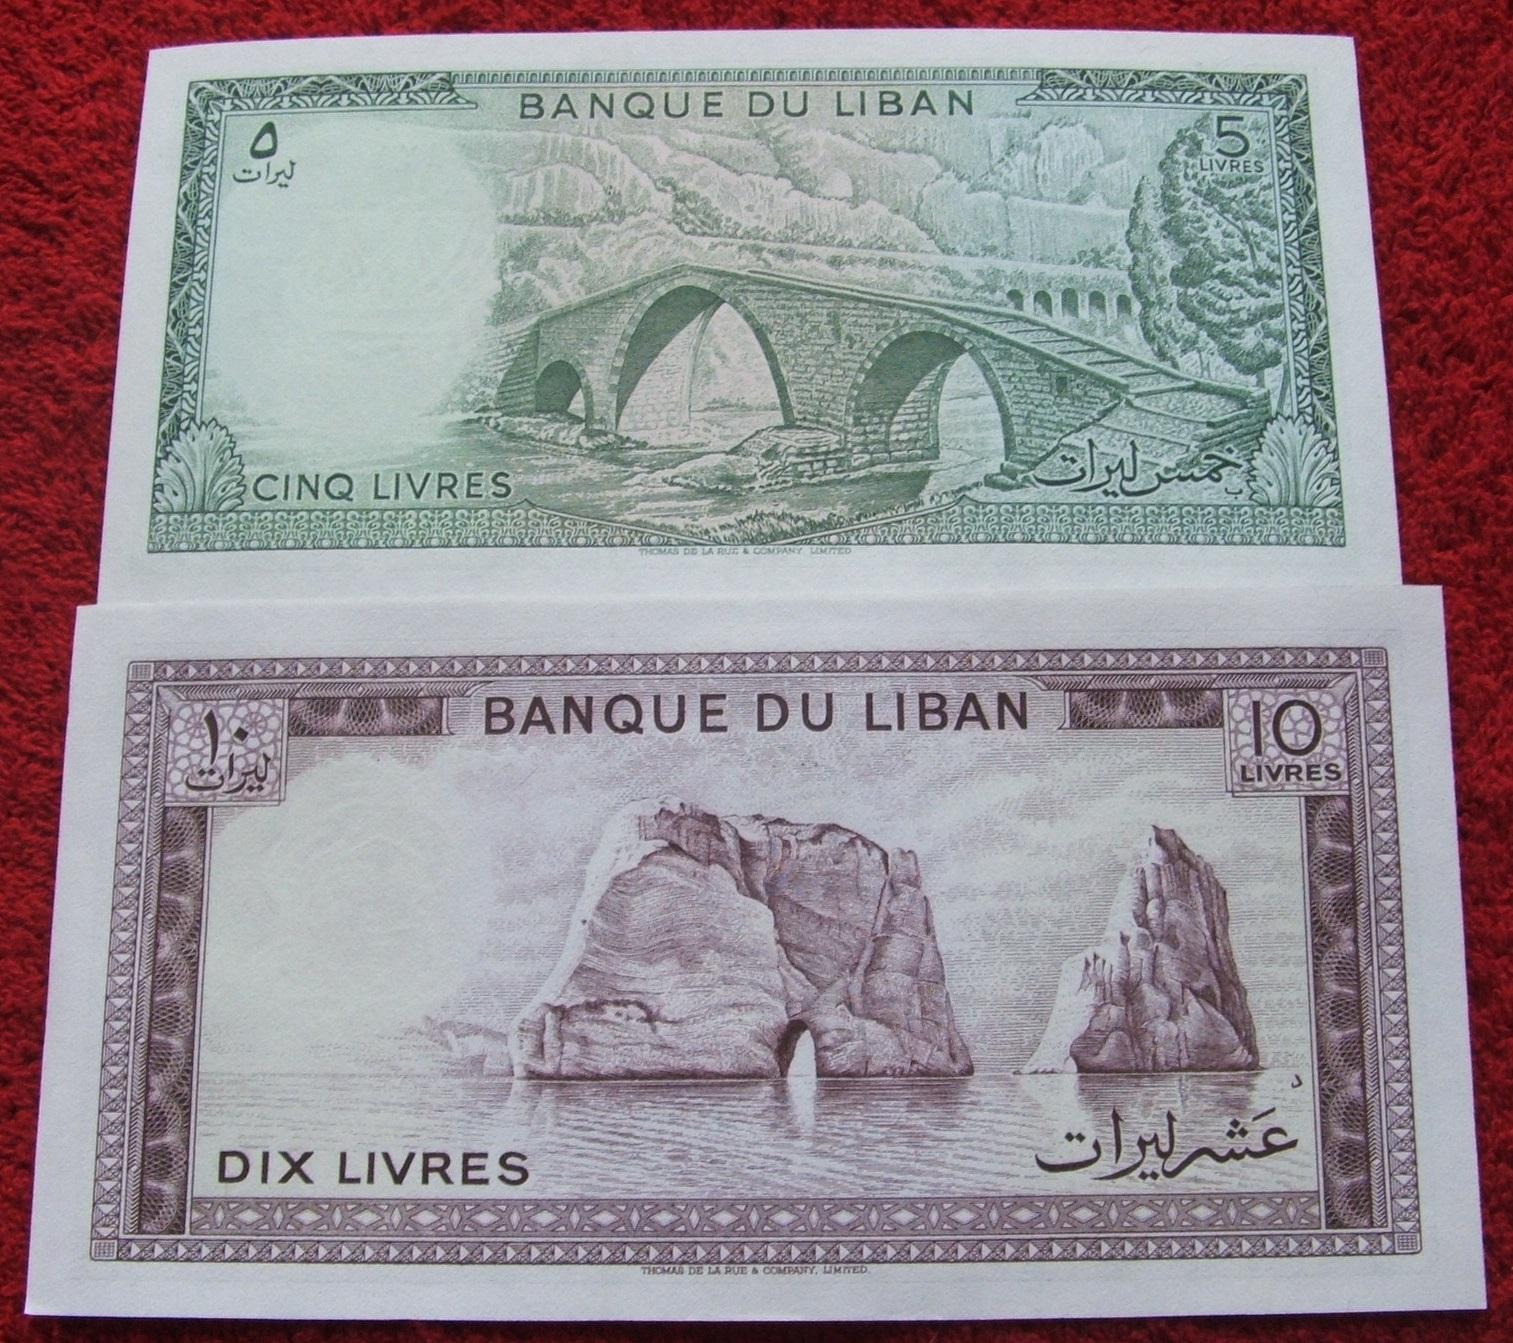 ZESTAW BANKNOTÓW LIBAN !!! STAN UNC !!! SUPER